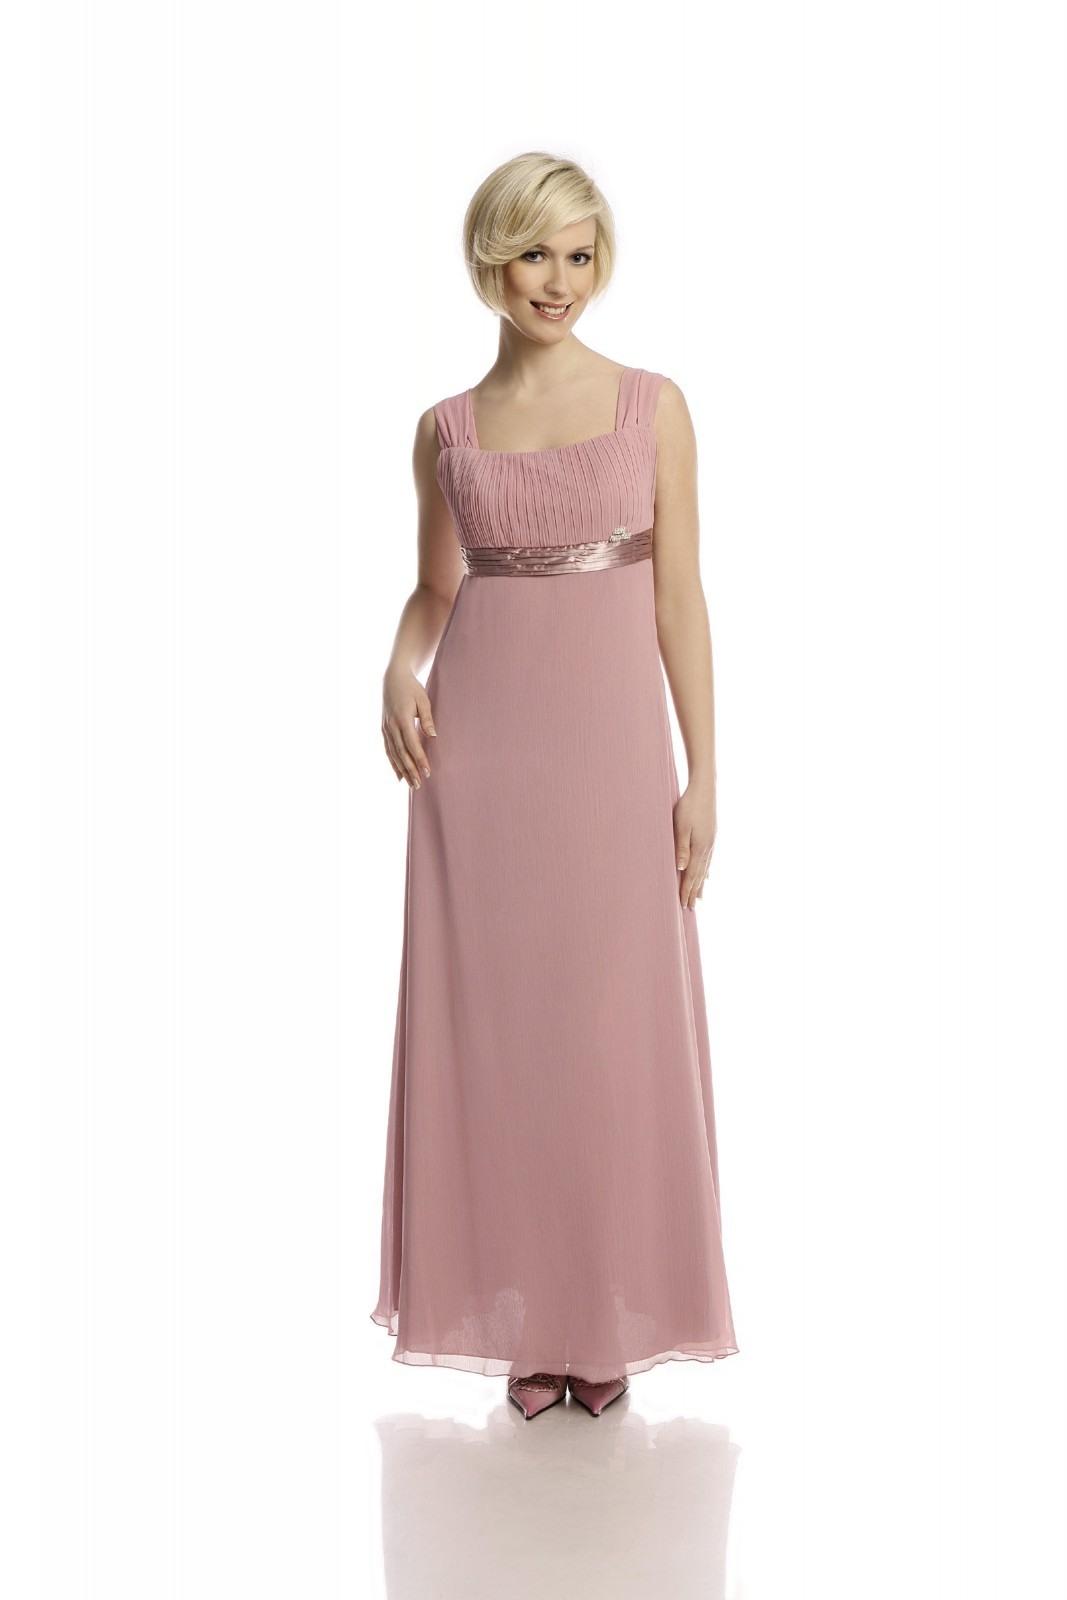 17 Schön Kleid Altrosa Lang SpezialgebietFormal Fantastisch Kleid Altrosa Lang Boutique